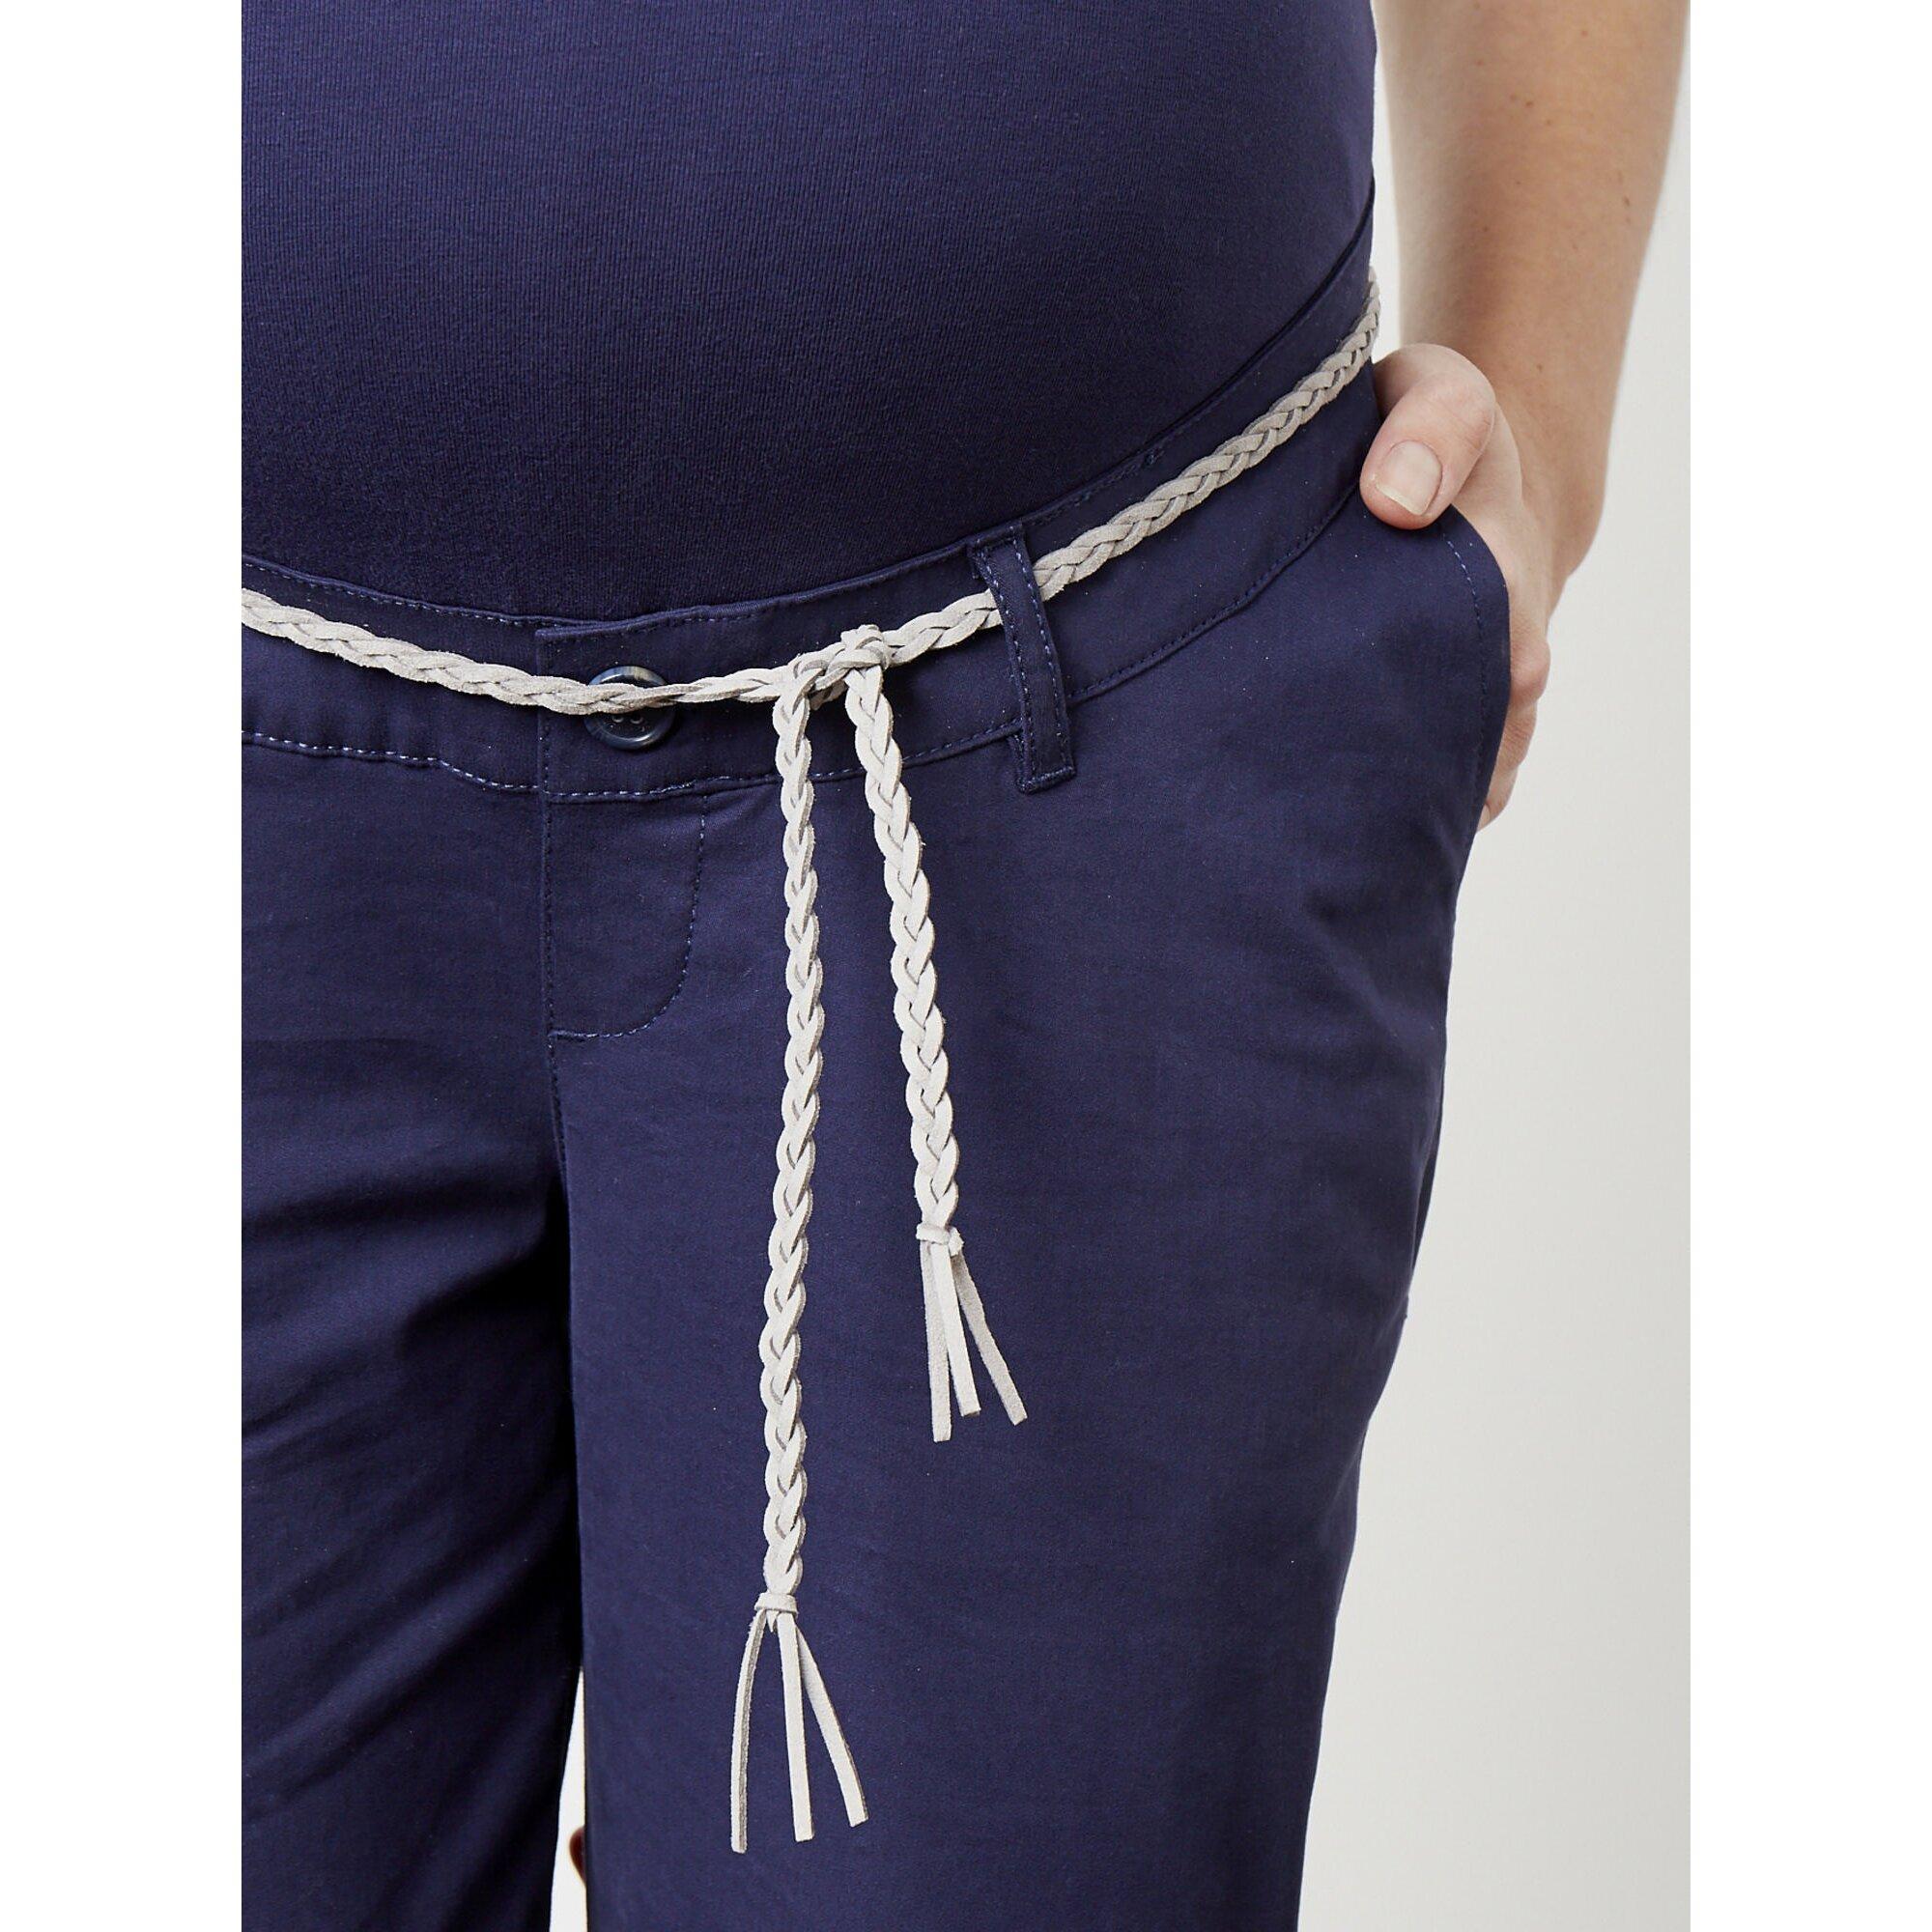 vertbaudet-umstands-chinohose-schrittlange-82-cm, 26.99 EUR @ babywalz-de